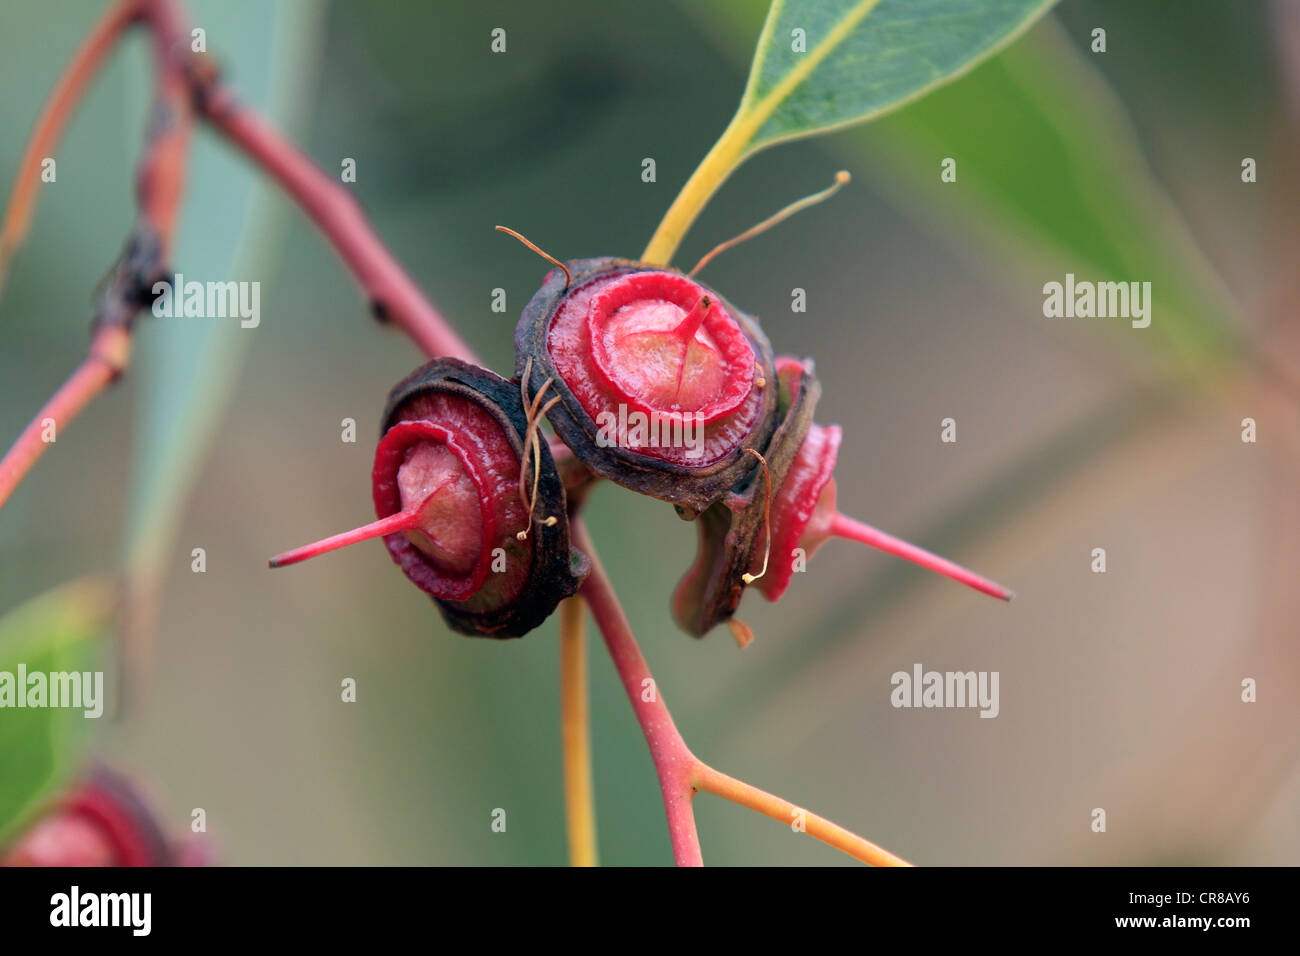 Eucalyptus tree (Eucalyptus pachyphylla), fruit, Outback, Alice Springs, Northern Territory, Australia - Stock Image